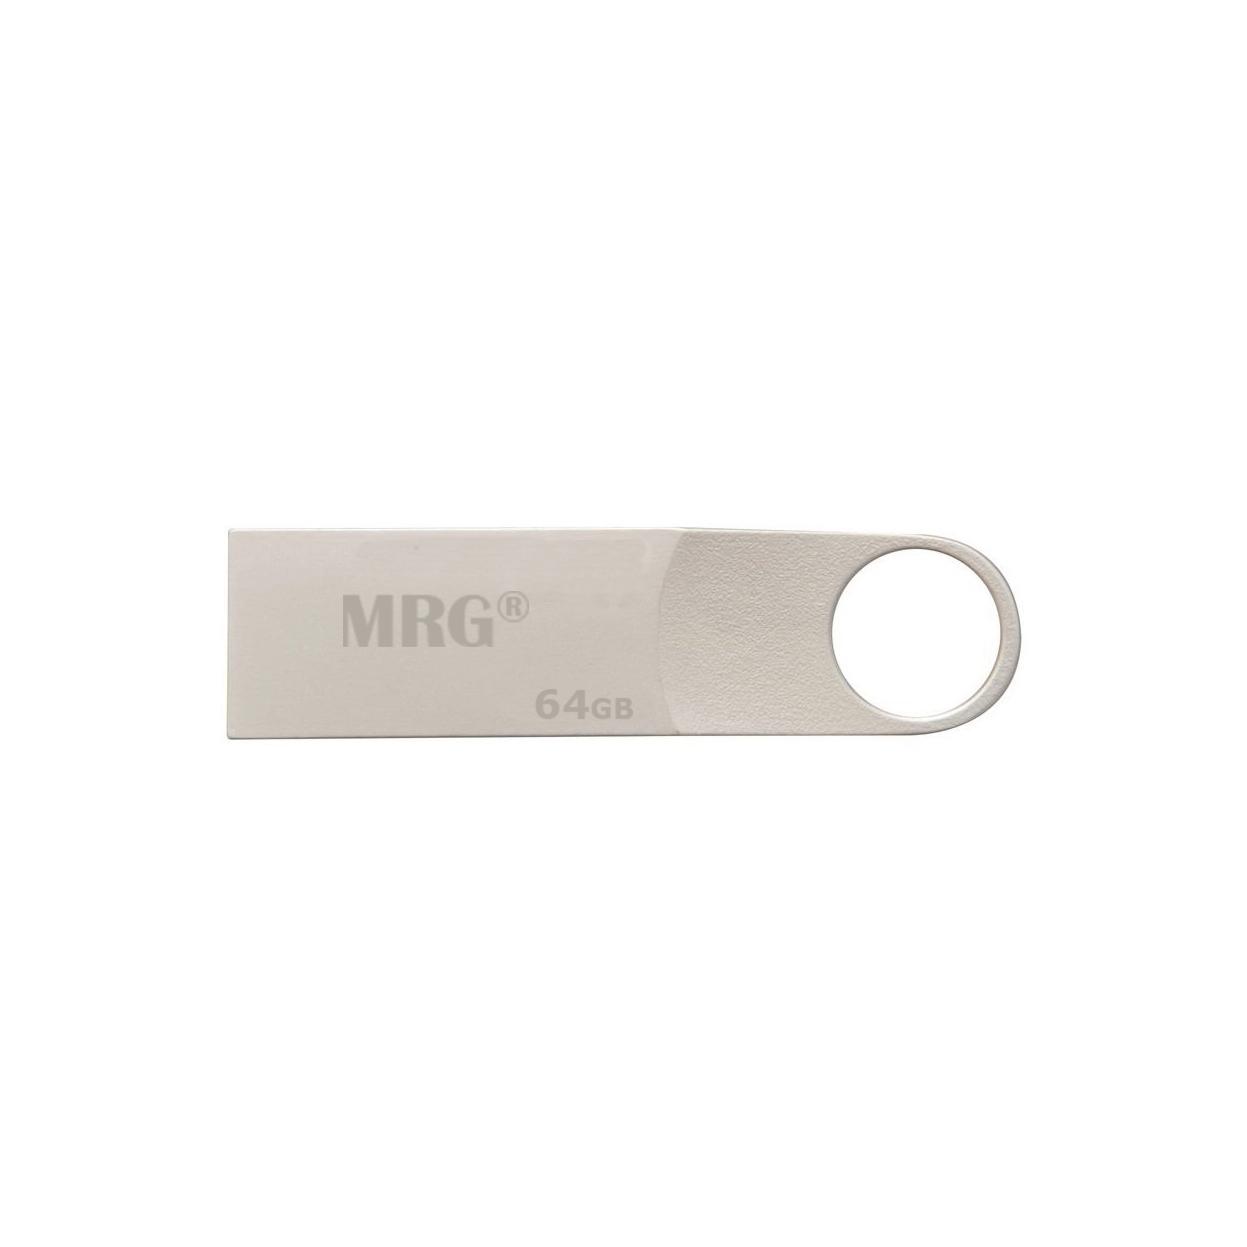 Memorie USB MRG M-SE9, USB 2.0, 64 GB, Gri